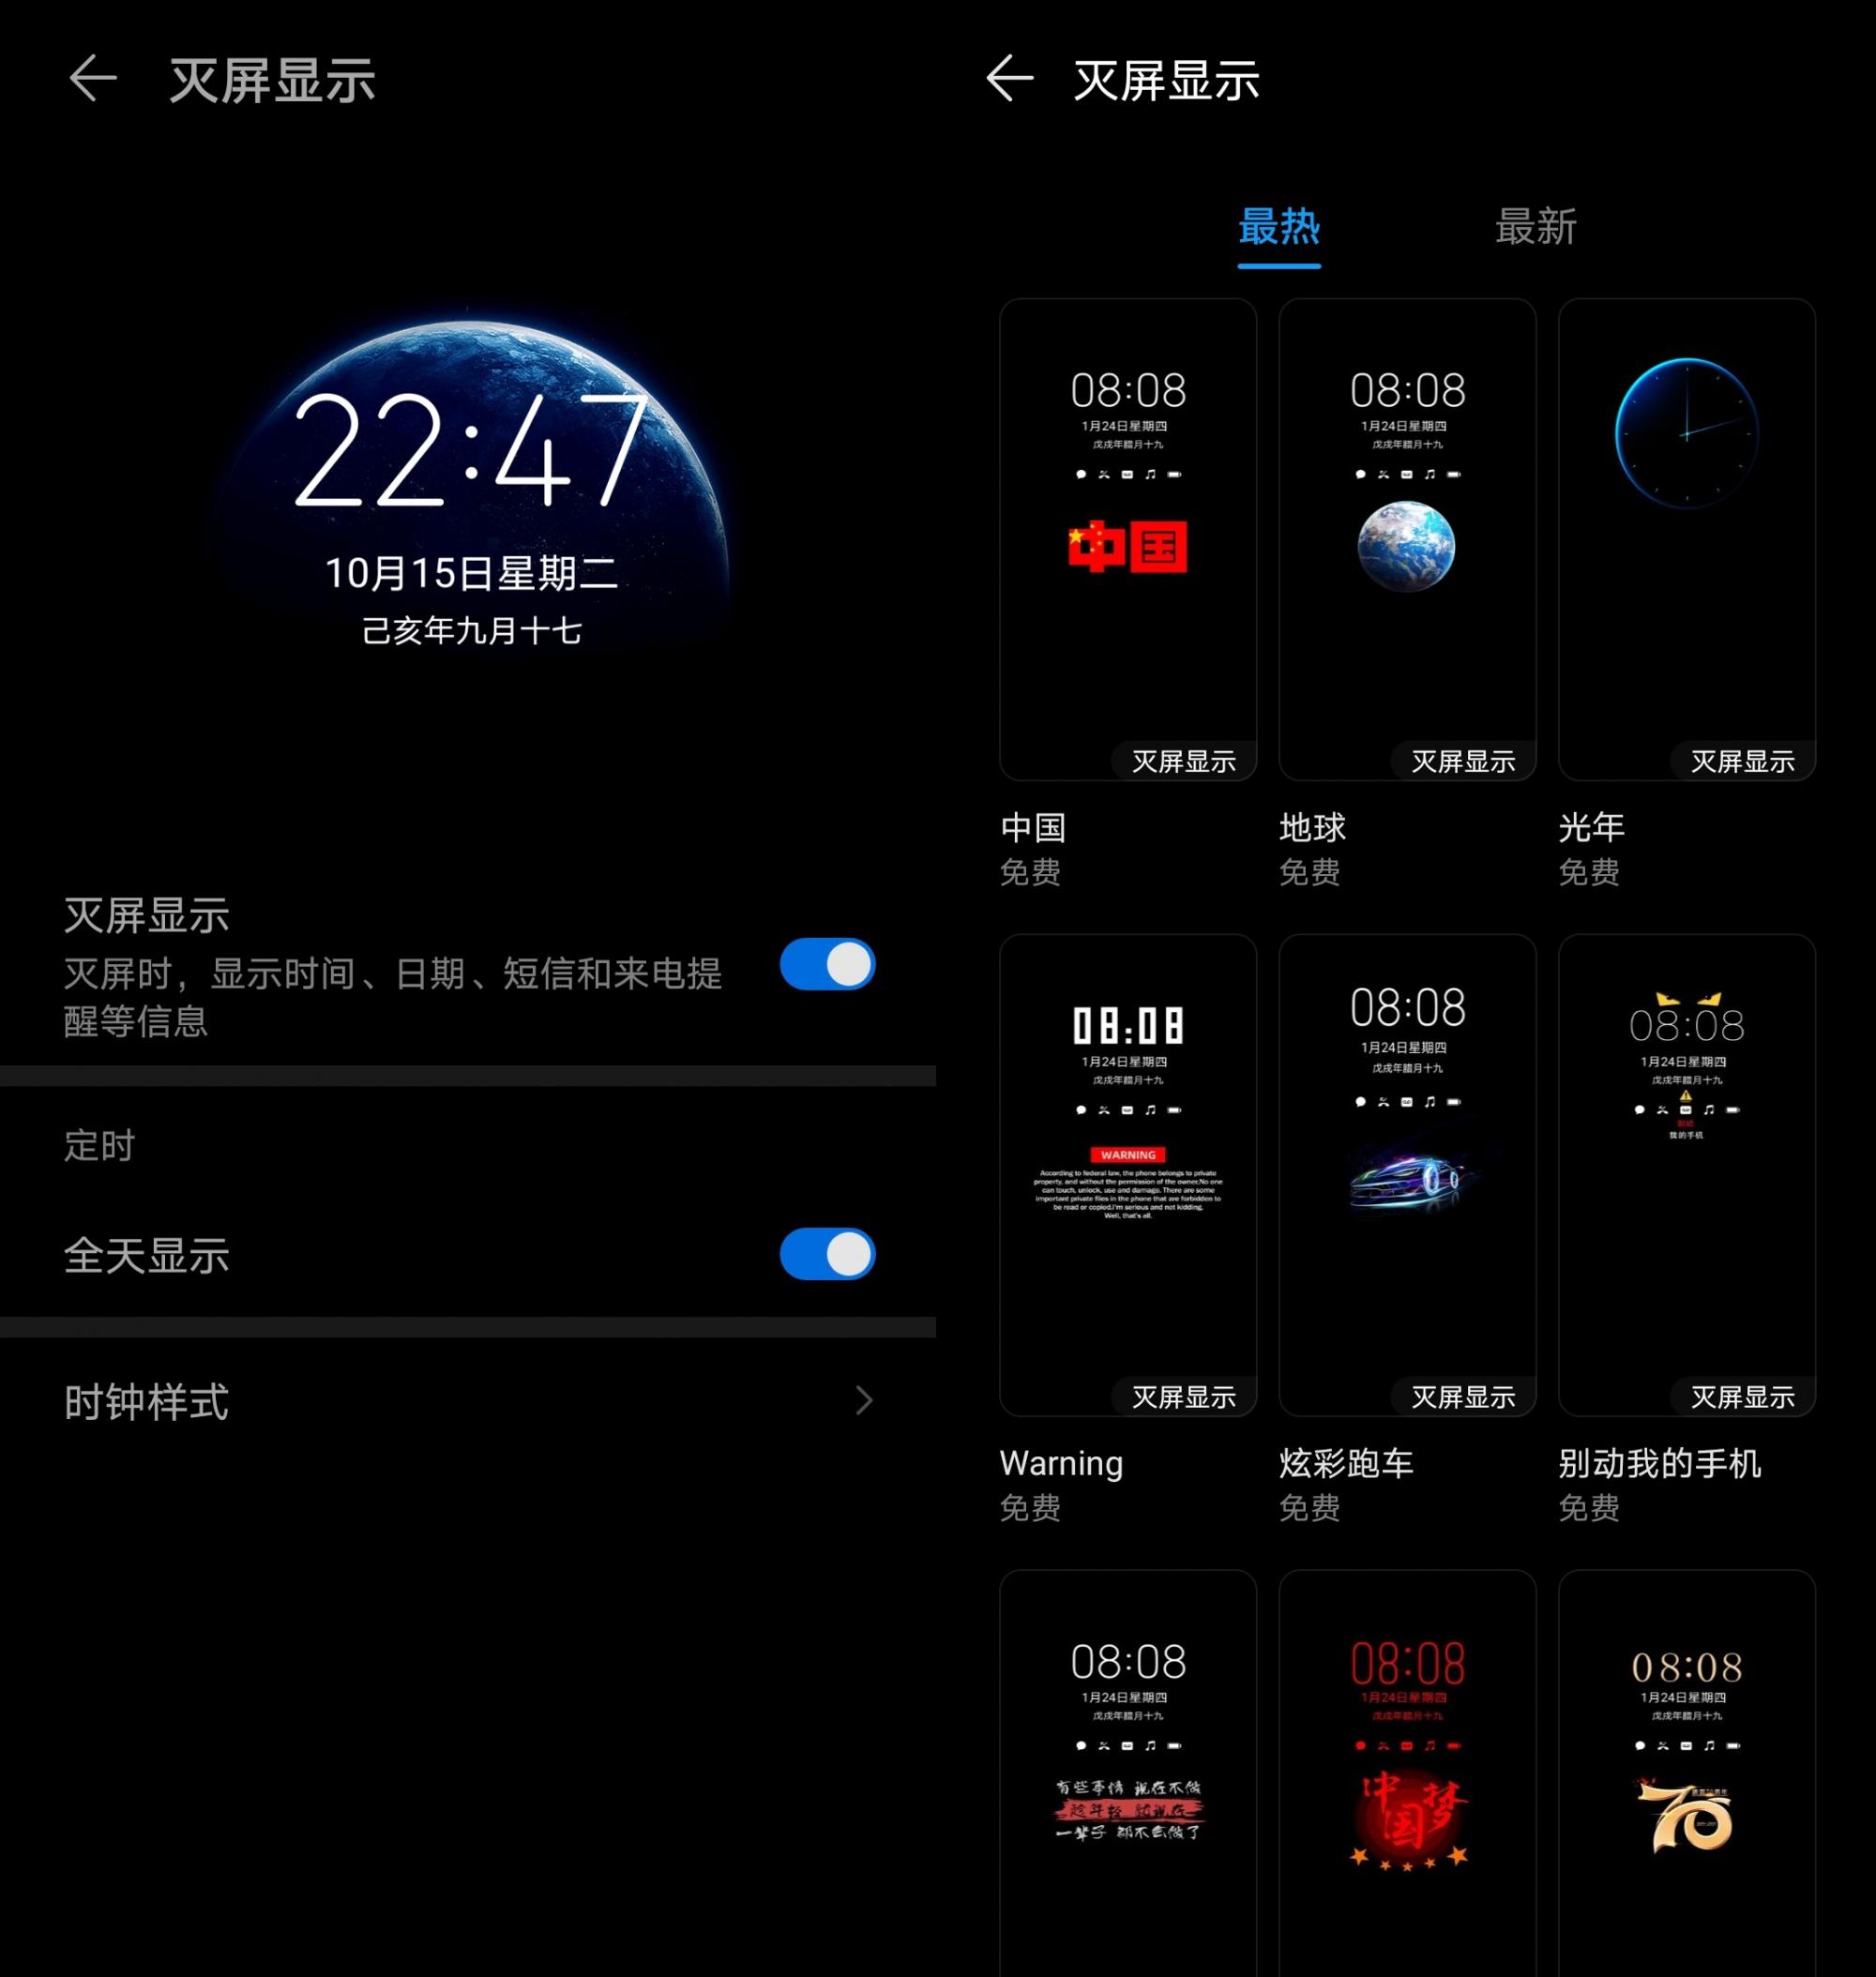 Screenshot_20191015_224800_com.huawei.aod.jpg